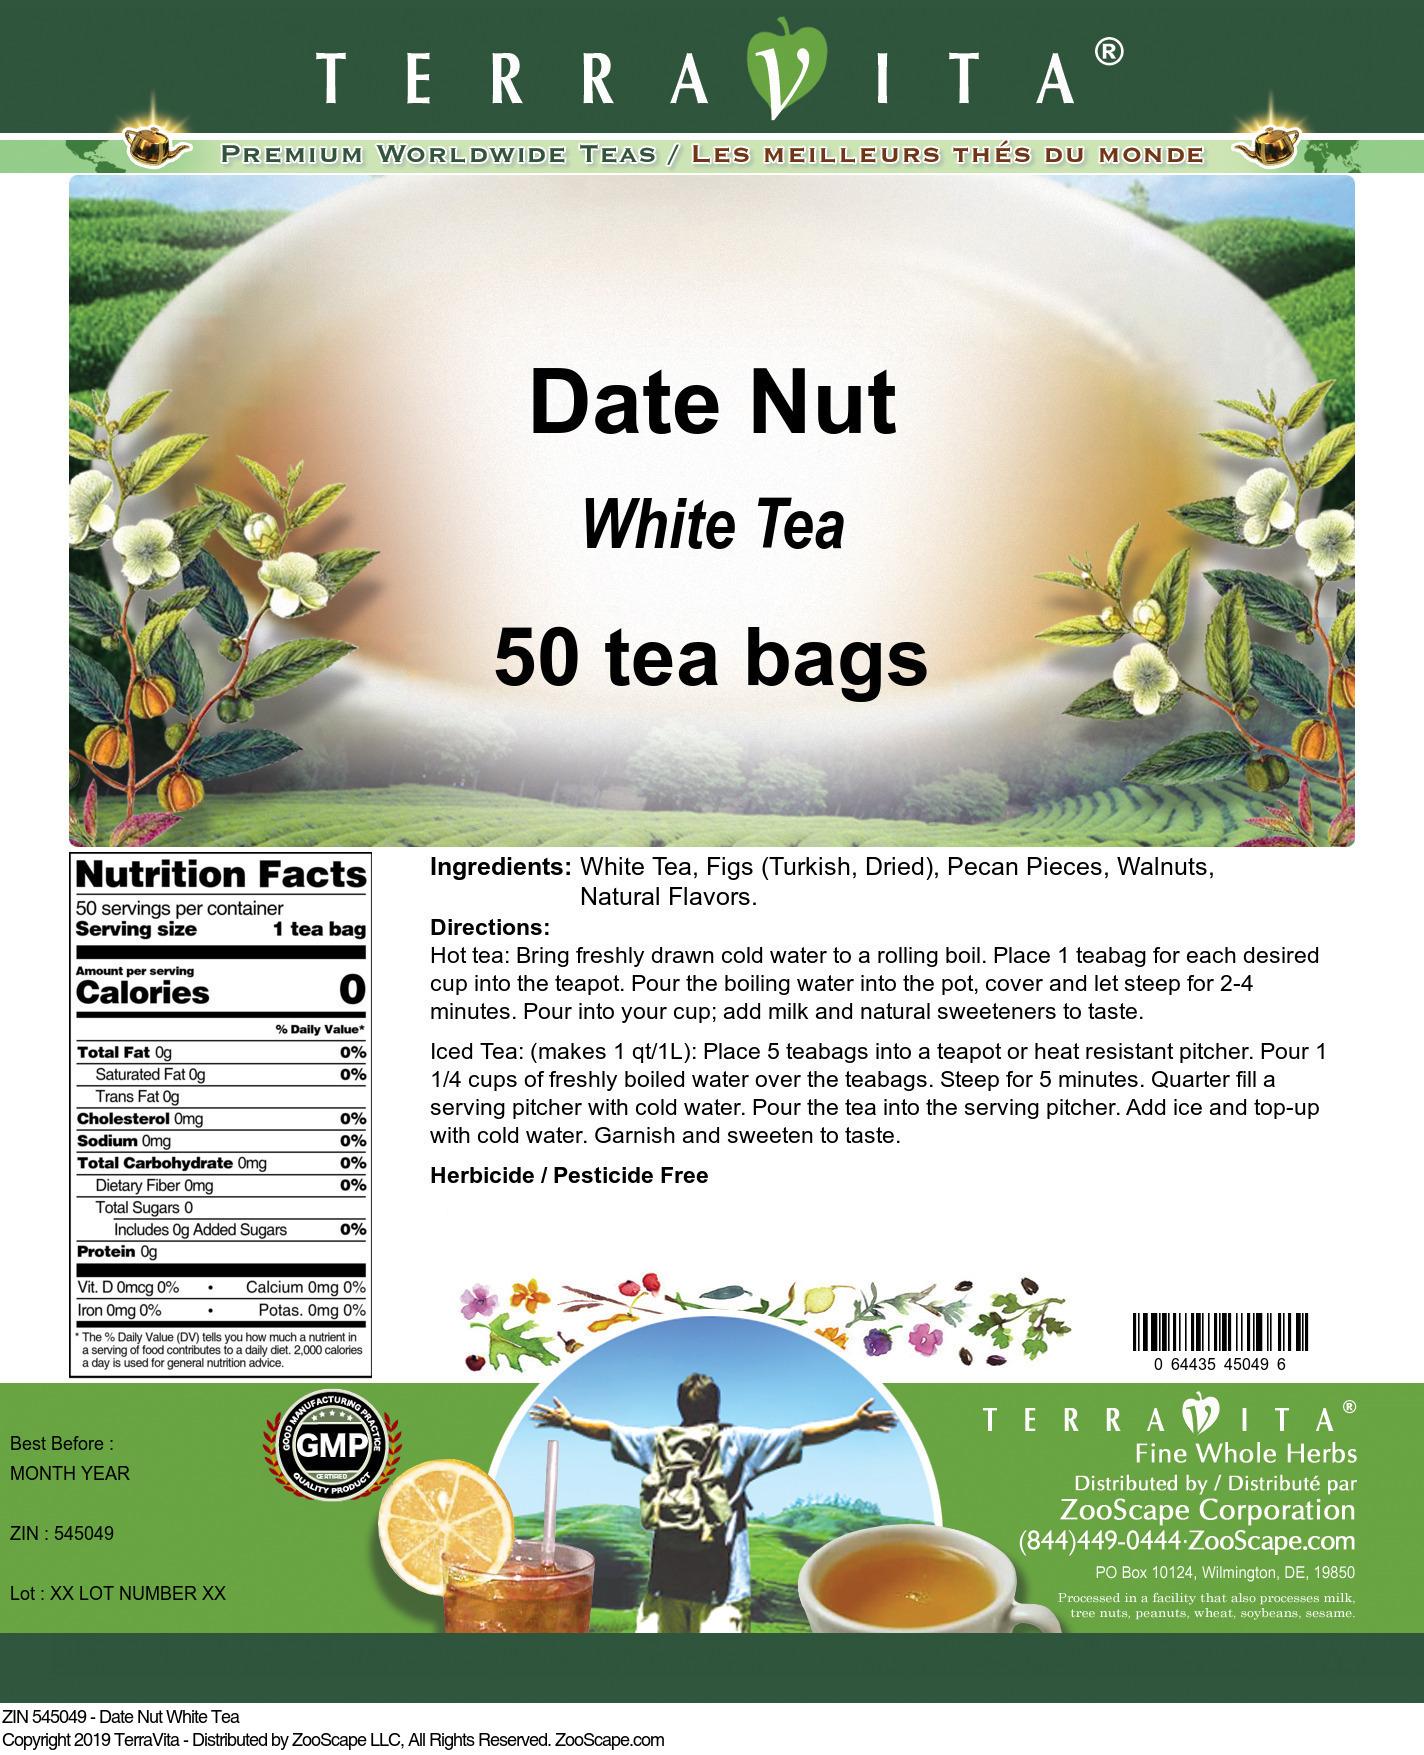 Date Nut White Tea